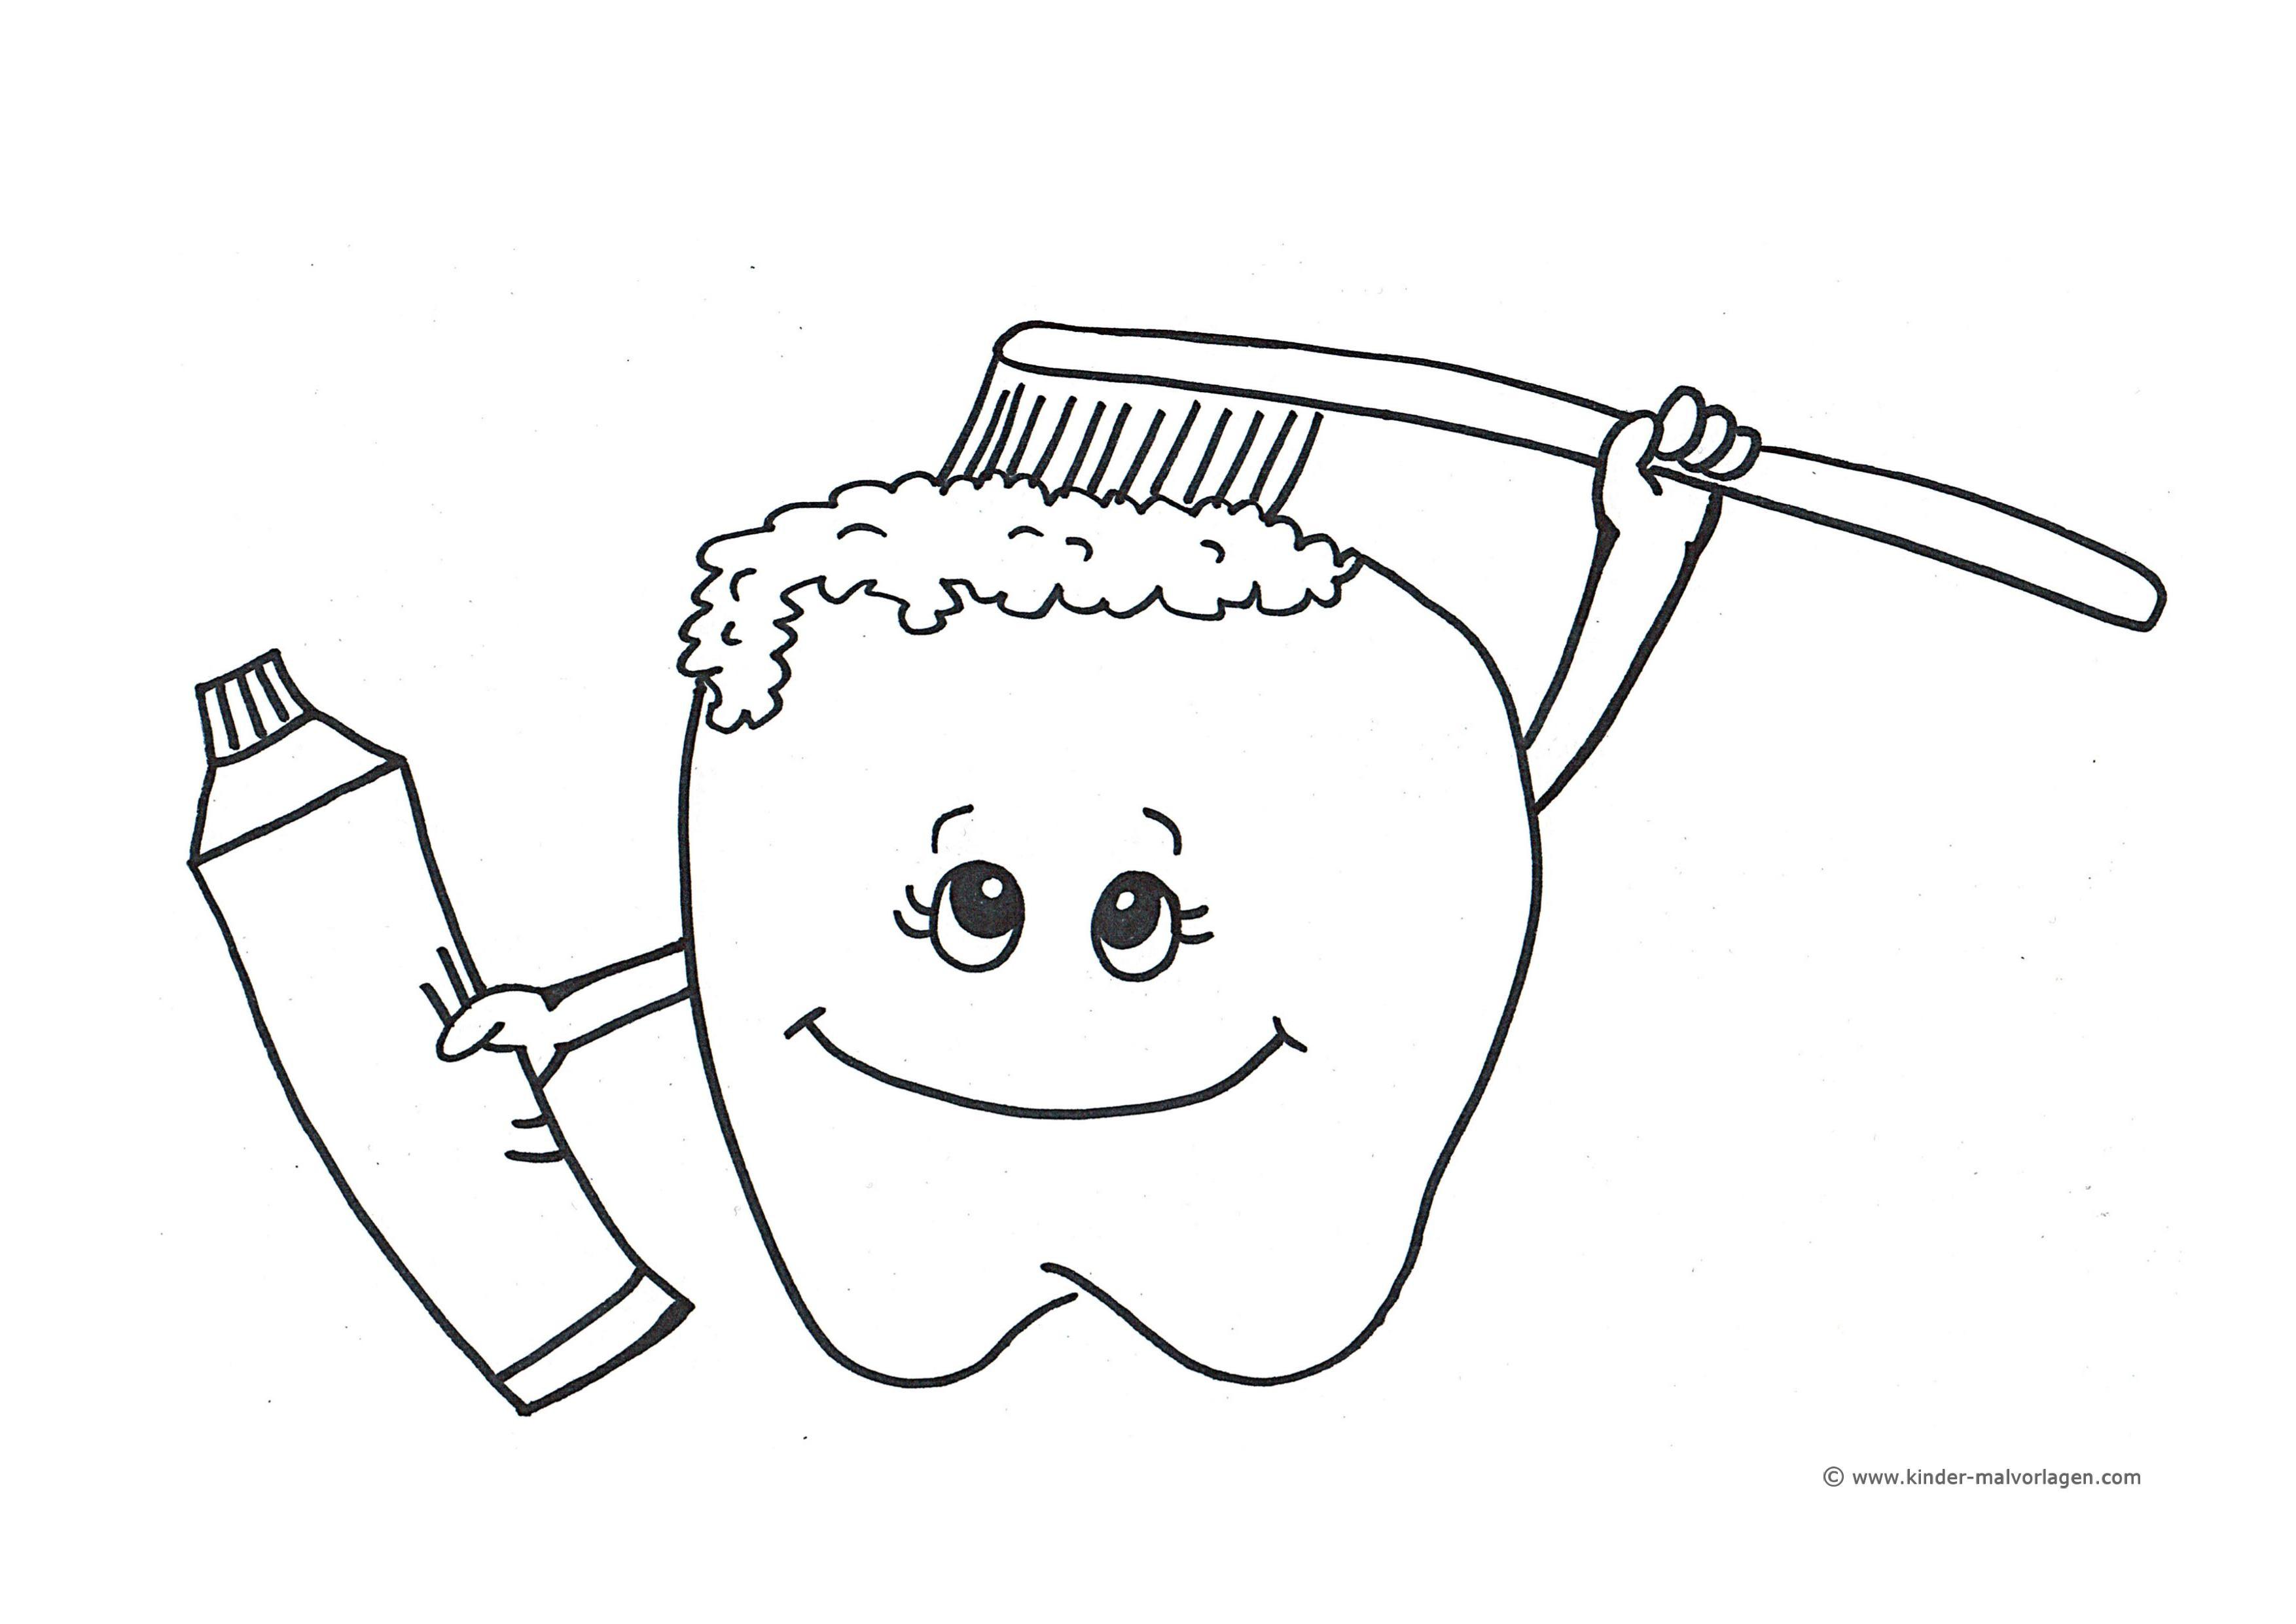 Kinder Malvorlagen Com Neu Lagz Rheinland Pfalz Innen Ausmalbild Zahn Kinderbilderub Stock